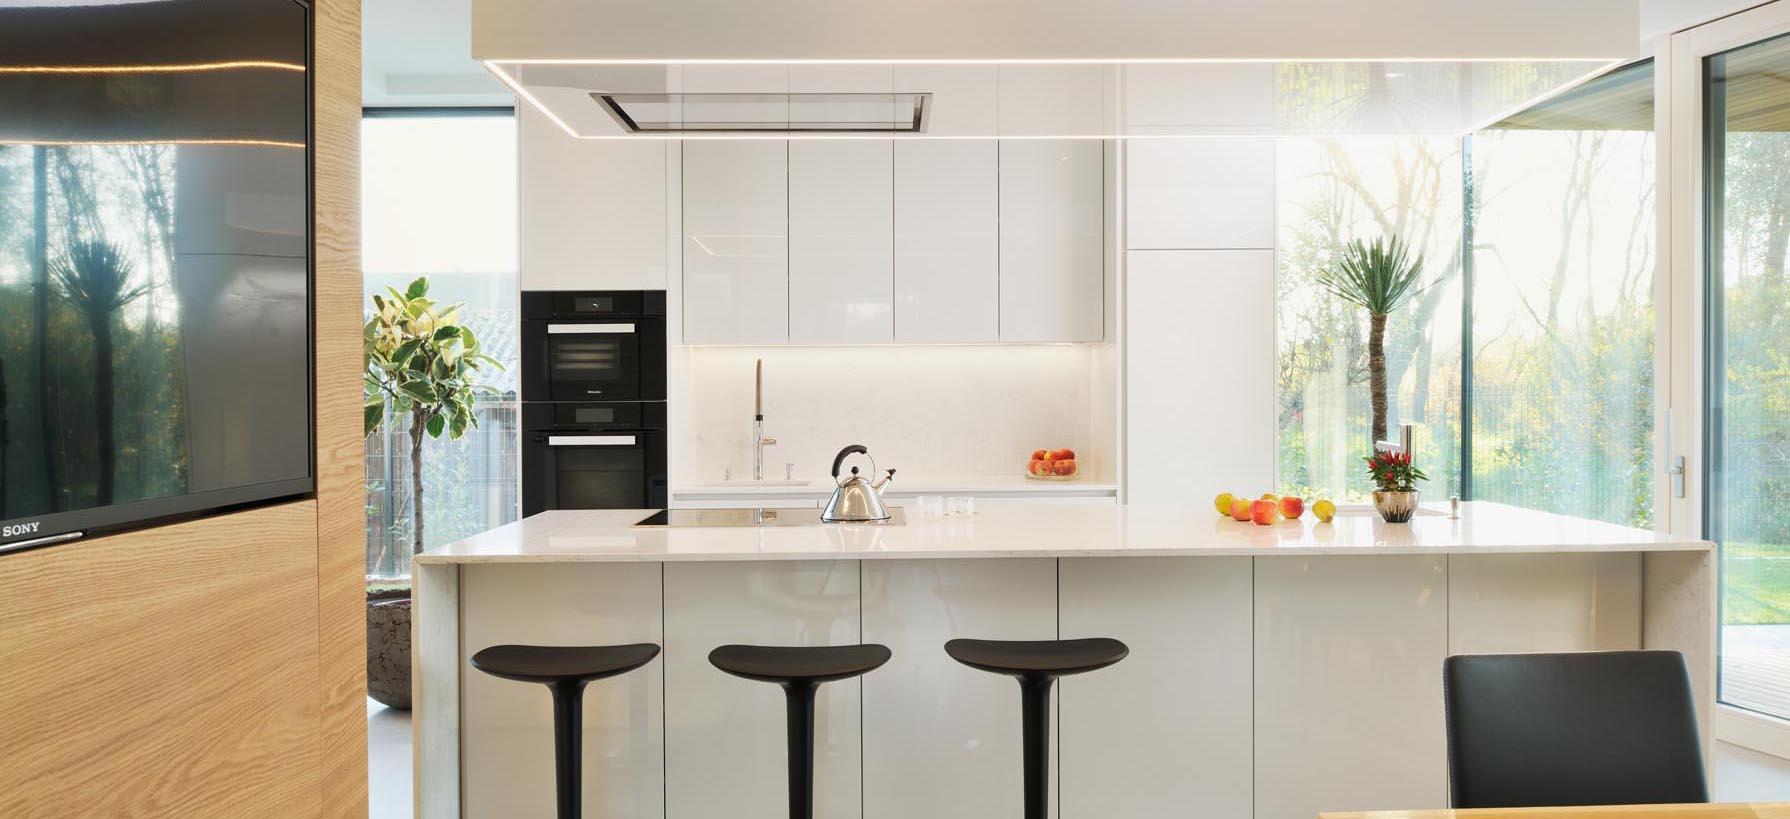 kuhinja bela visoki sijaj